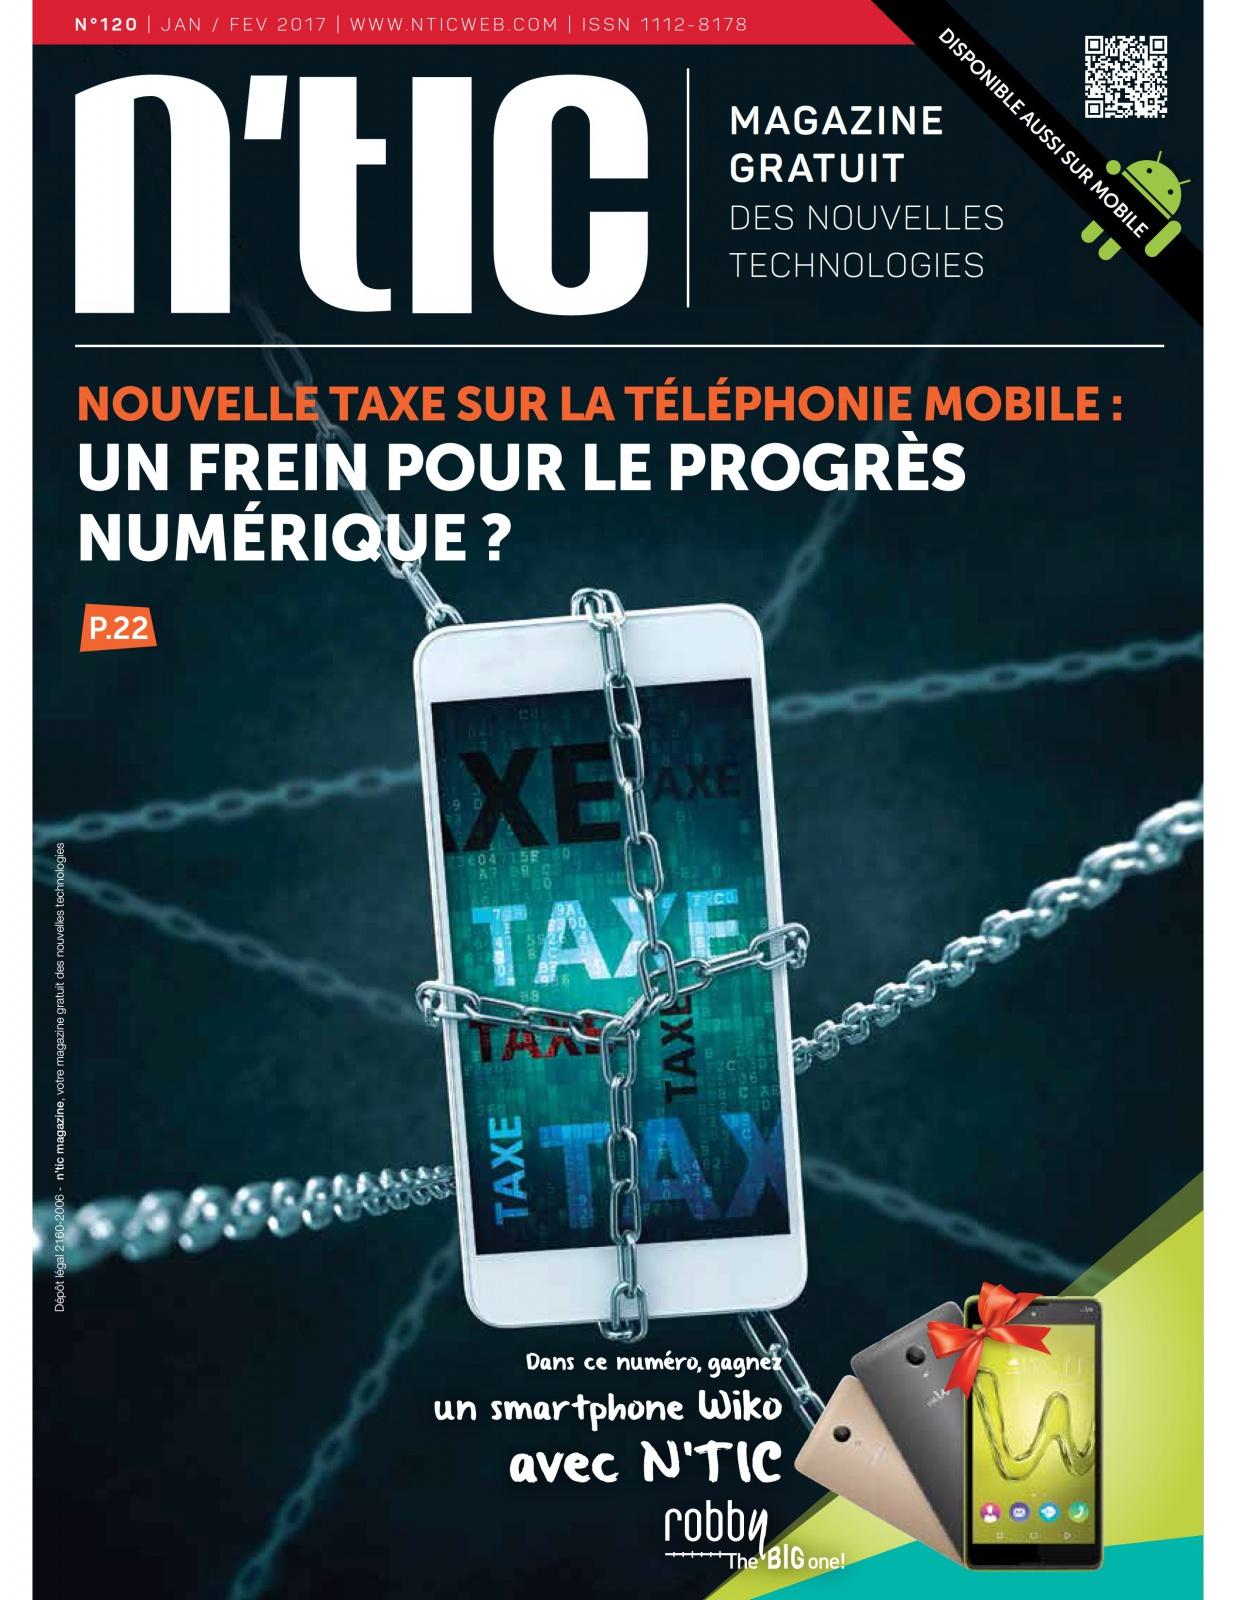 Magazine n'tic n° 120 Janvier/Fevrier 2017